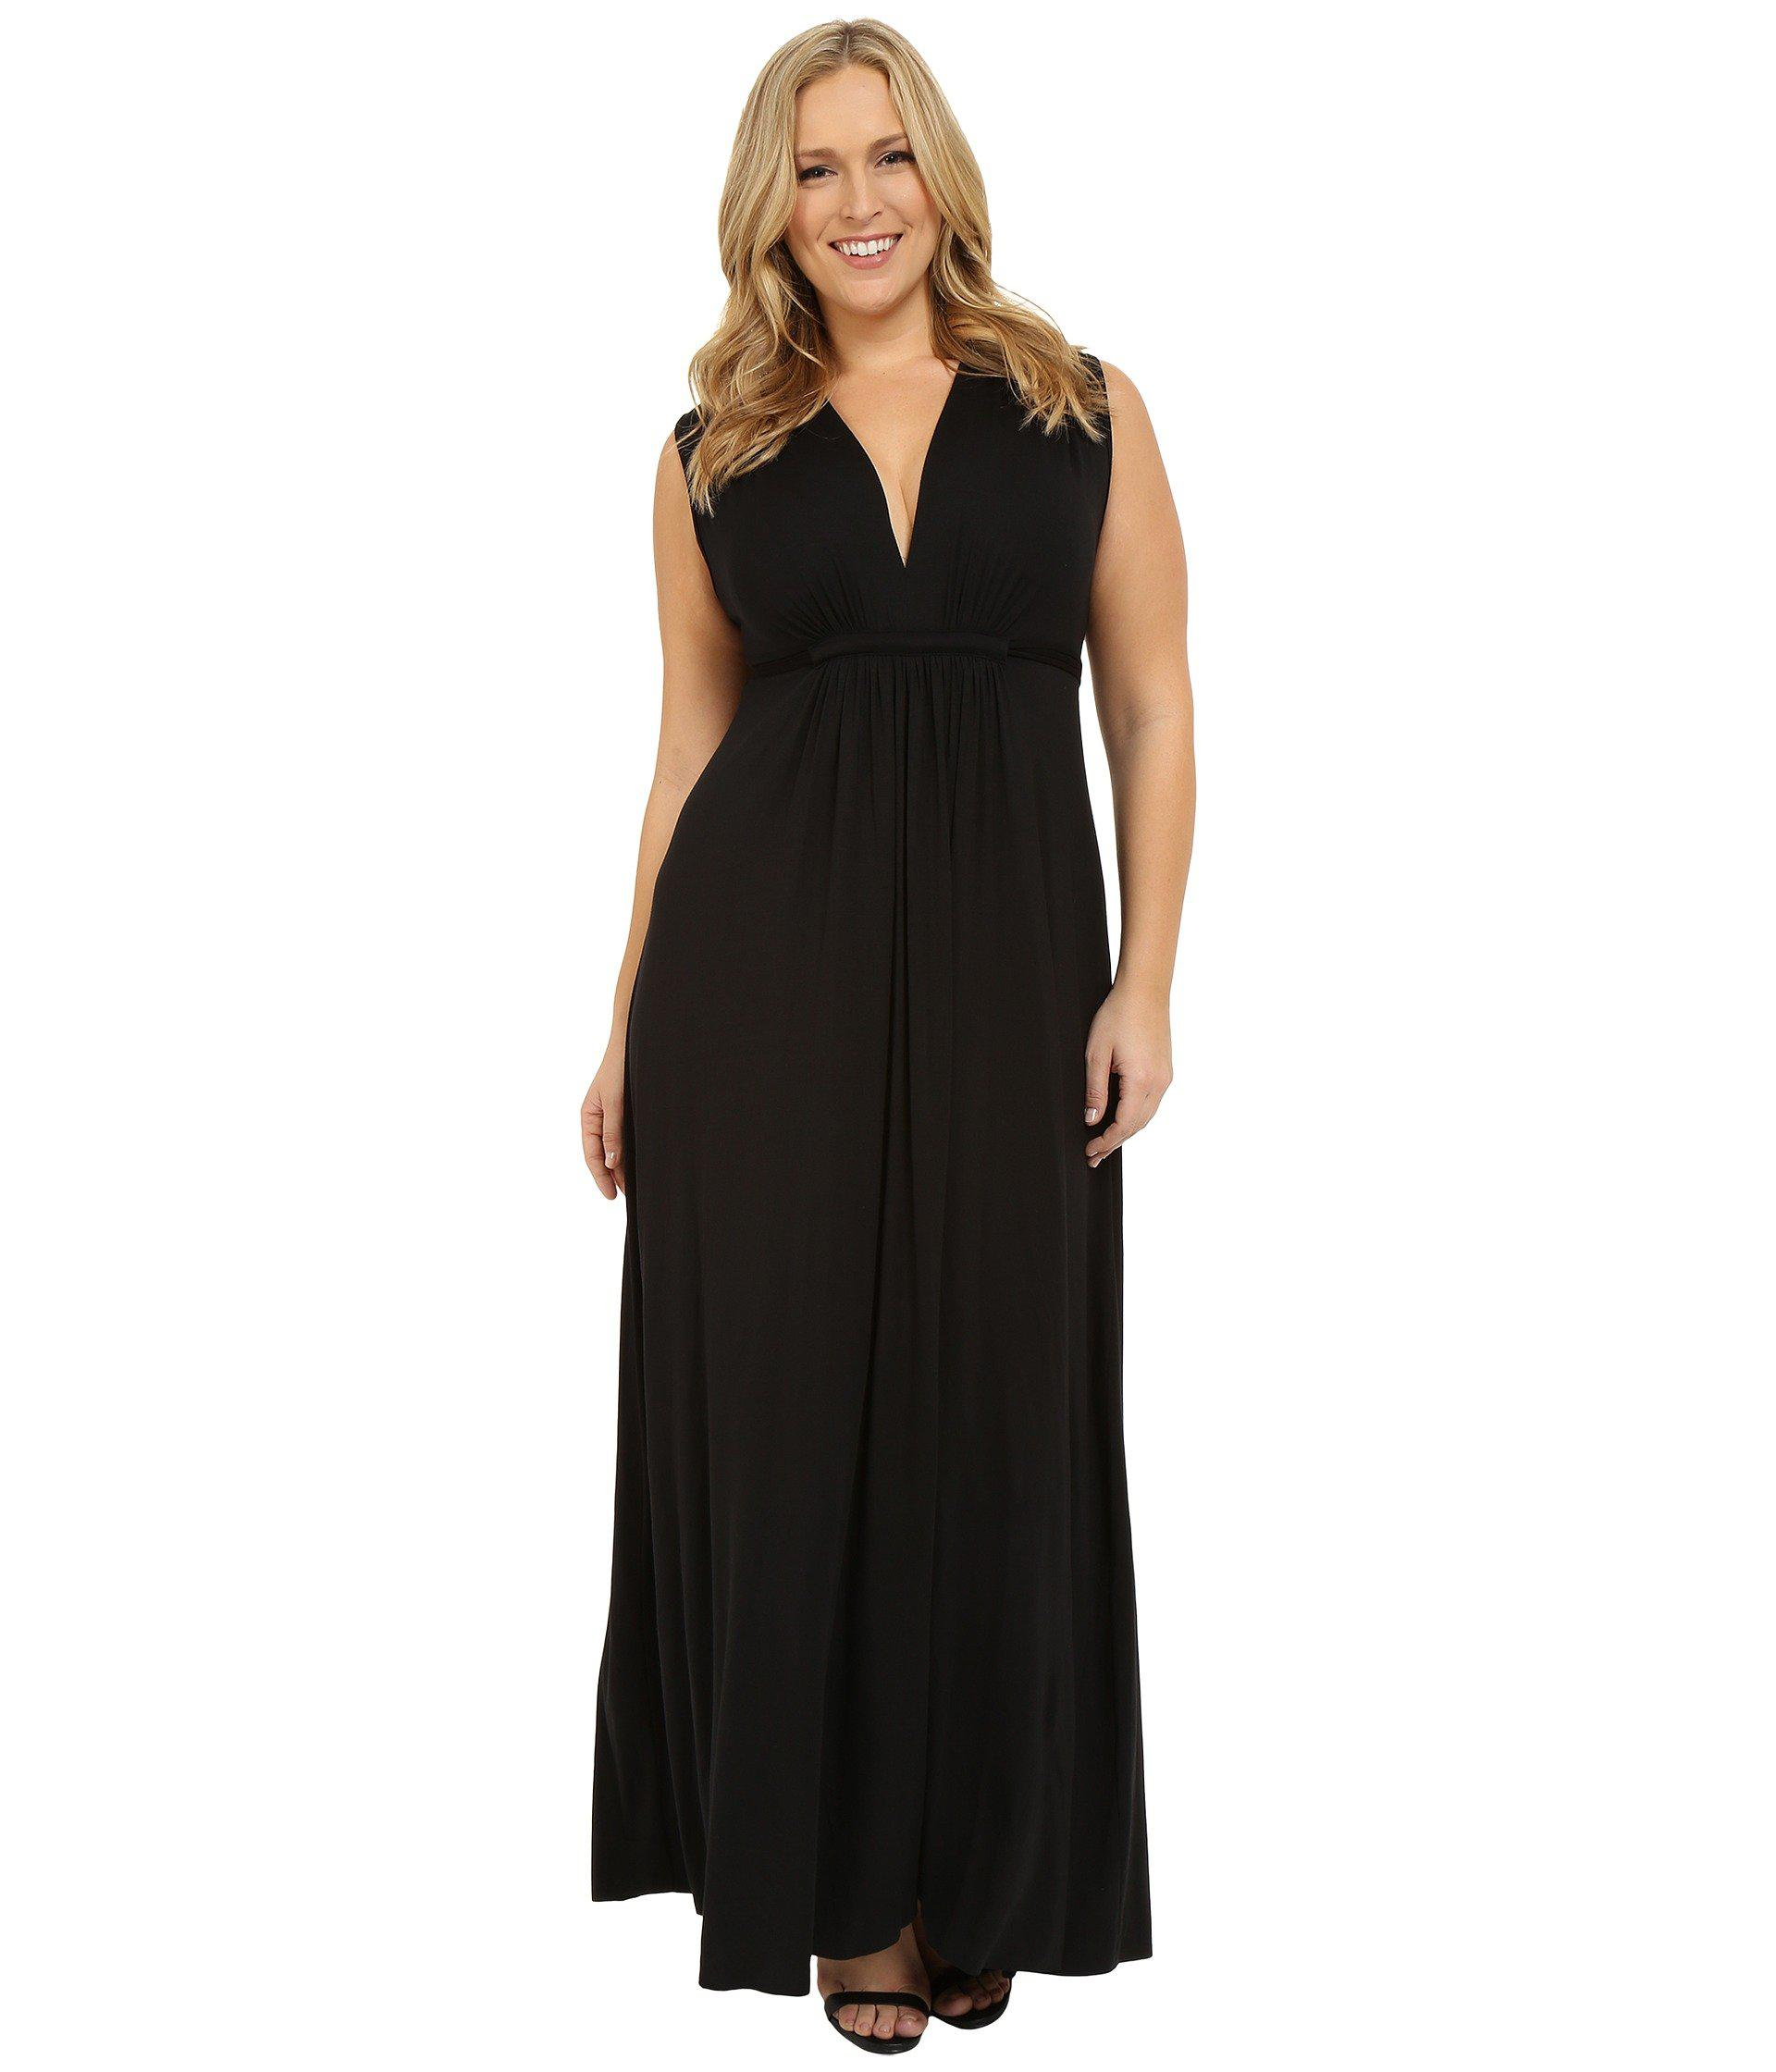 Lyst - Rachel Pally Plus Size Long Sleeveless Caftan (black) Women s ... 81a82c4ca